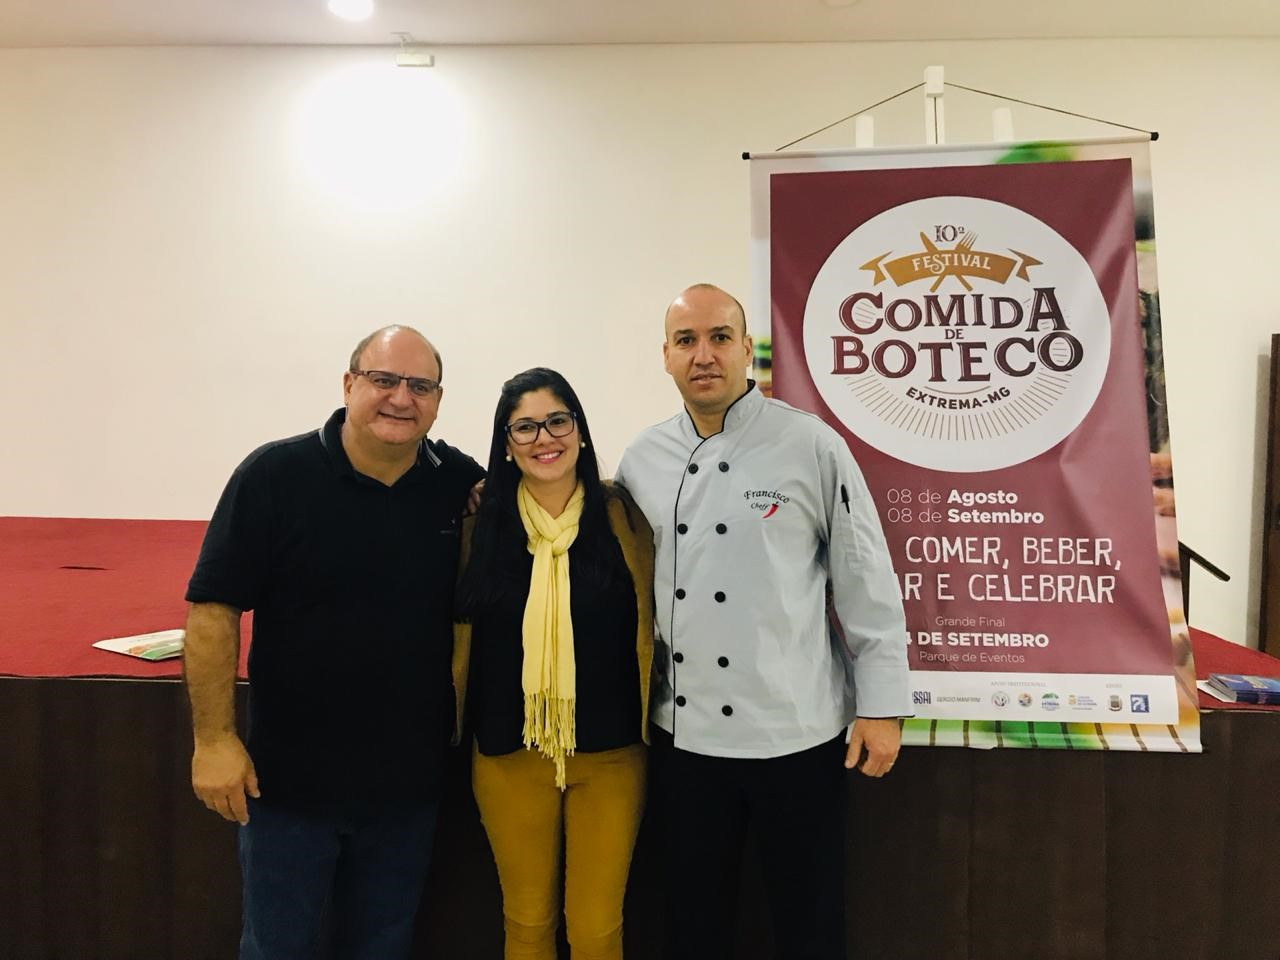 Edson Puiati, Ana Paula Odoni e José Francisco de Souza do Carmo